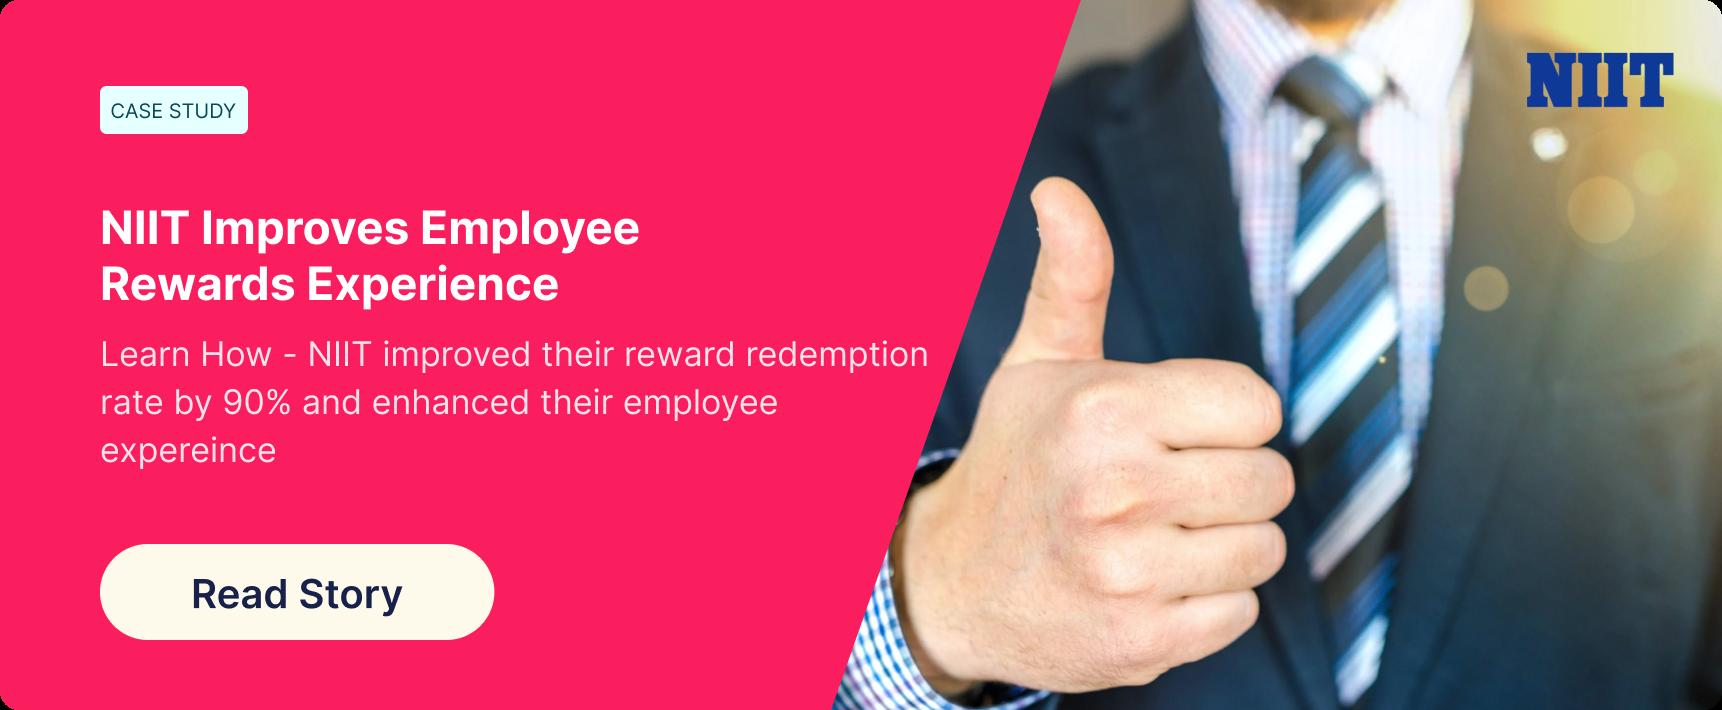 Employee Reward Experience